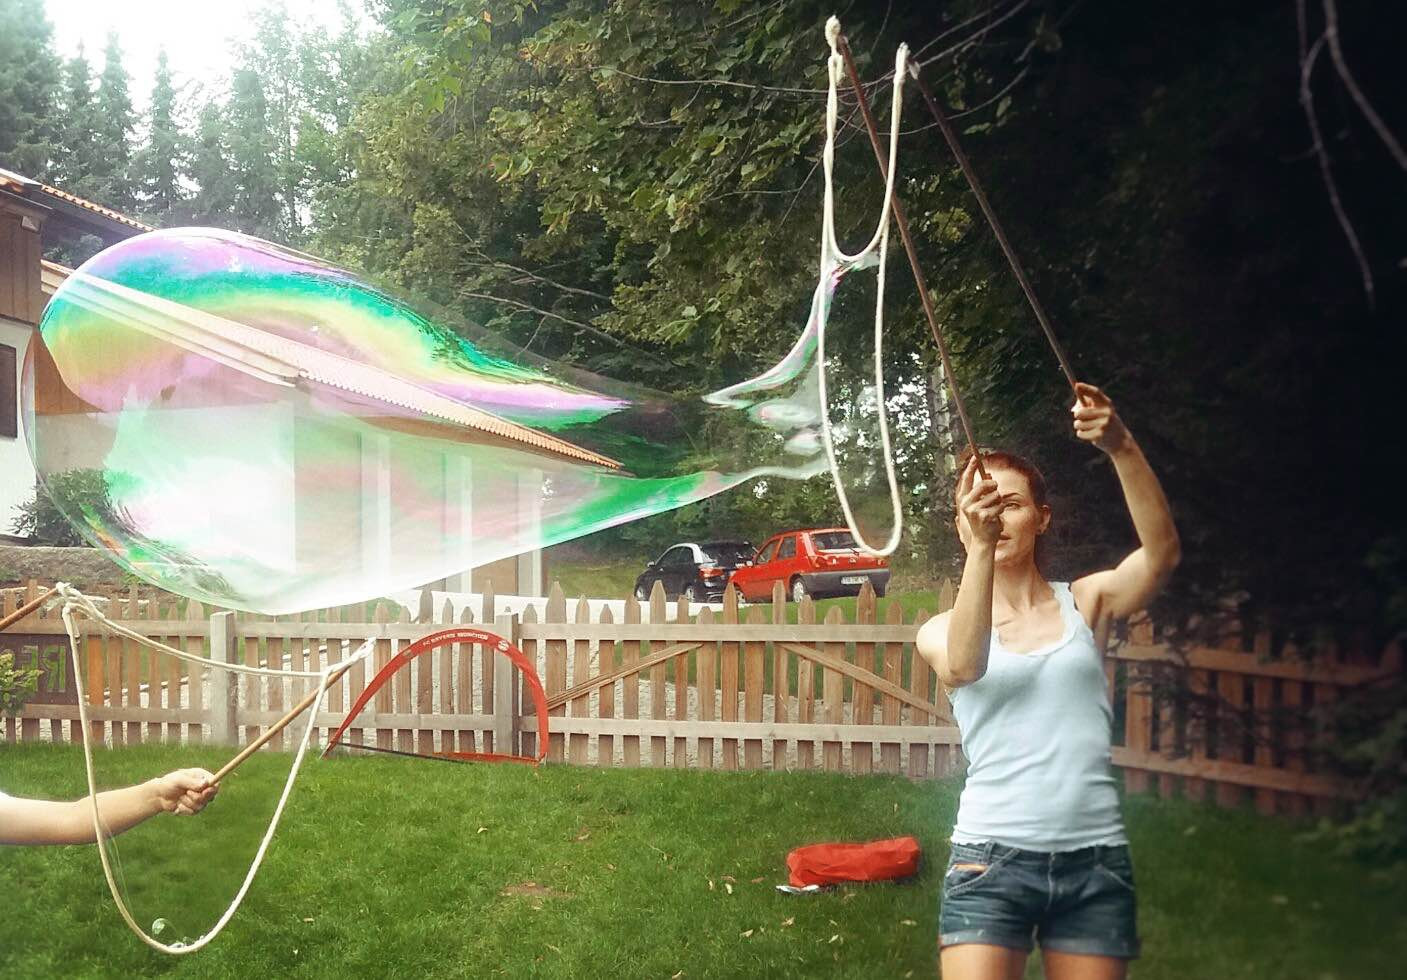 Riesenseifenblasen Diy  Riesenseifenblasen DIY